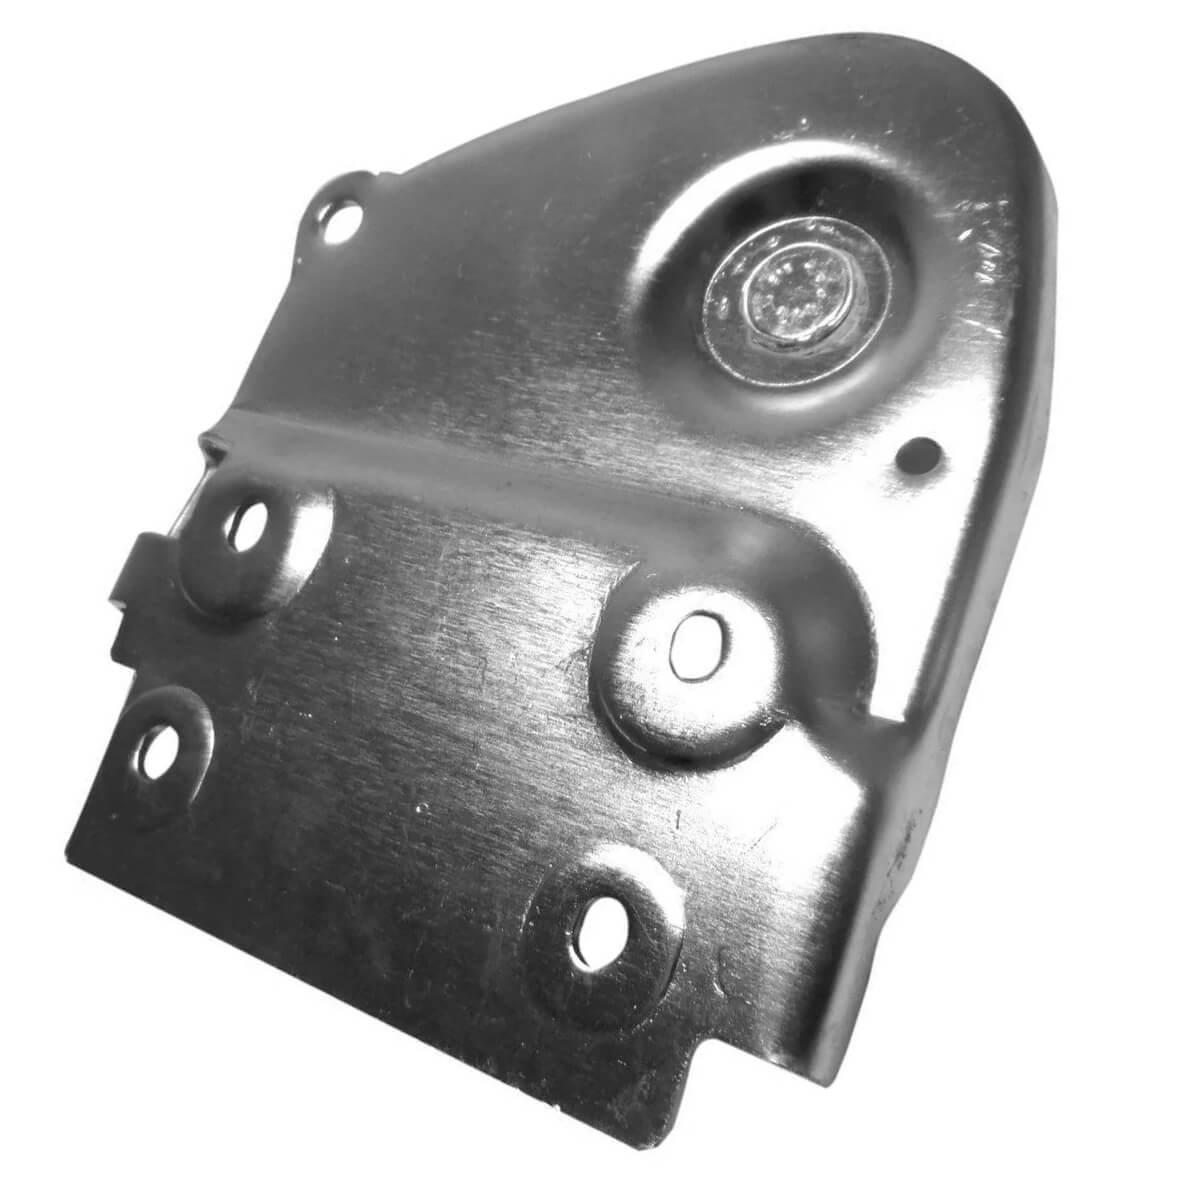 Dobradiça Inferior Direita Para Geladeira Dc51x Electrolux - 62545869